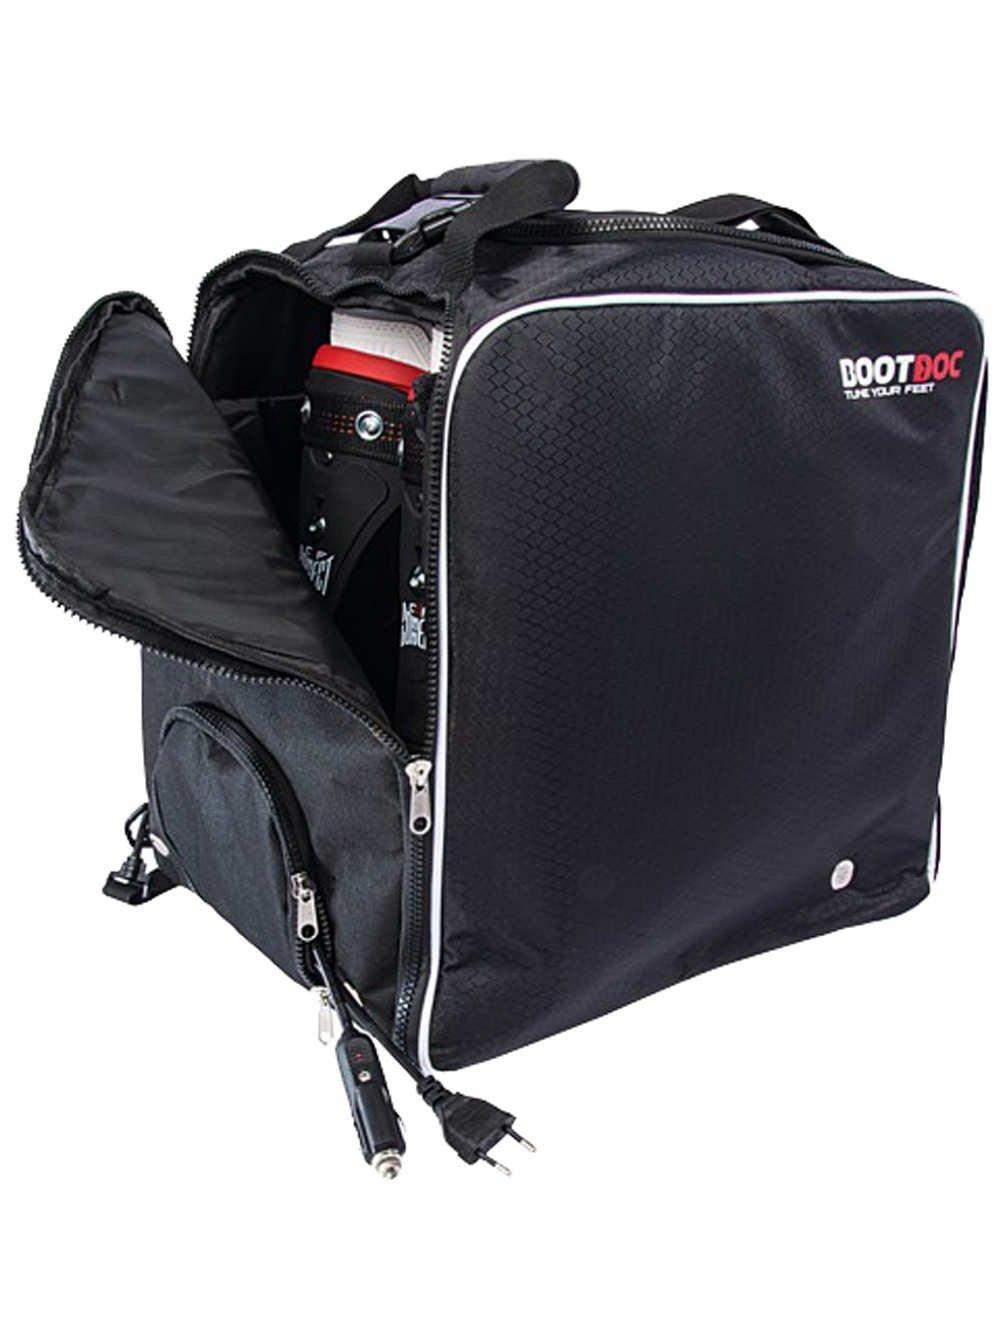 BootDoc Skiboots Accessoires BD Heated Ski Boot Bag